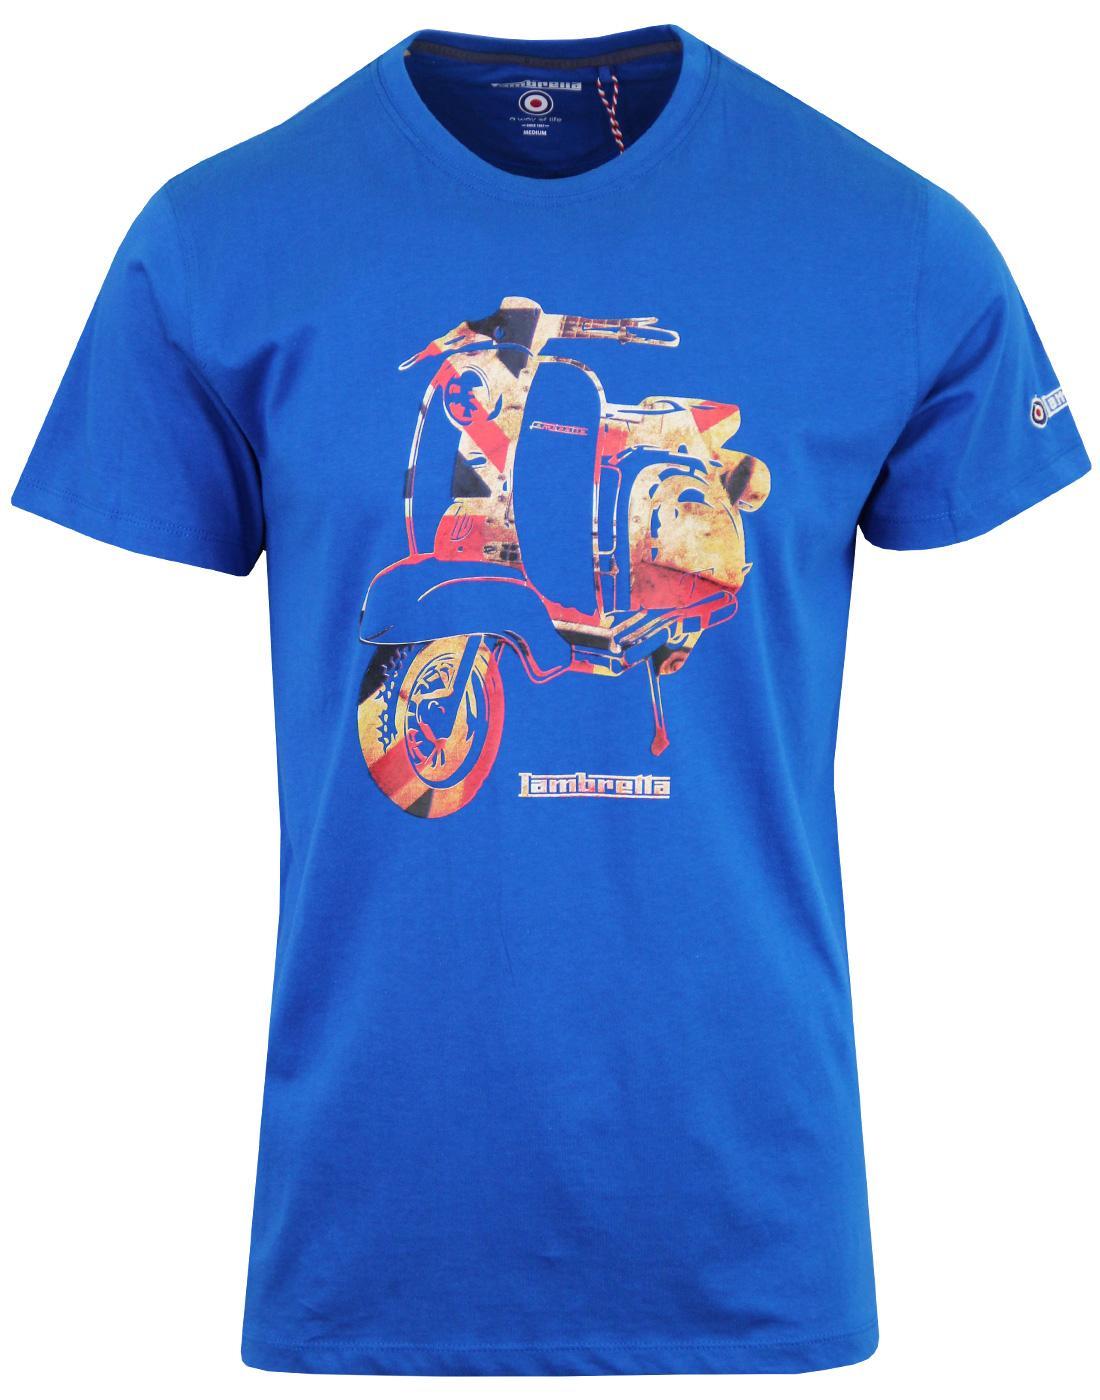 LAMBRETTA Retro Mod Union Jack Scooter Tee BLUE